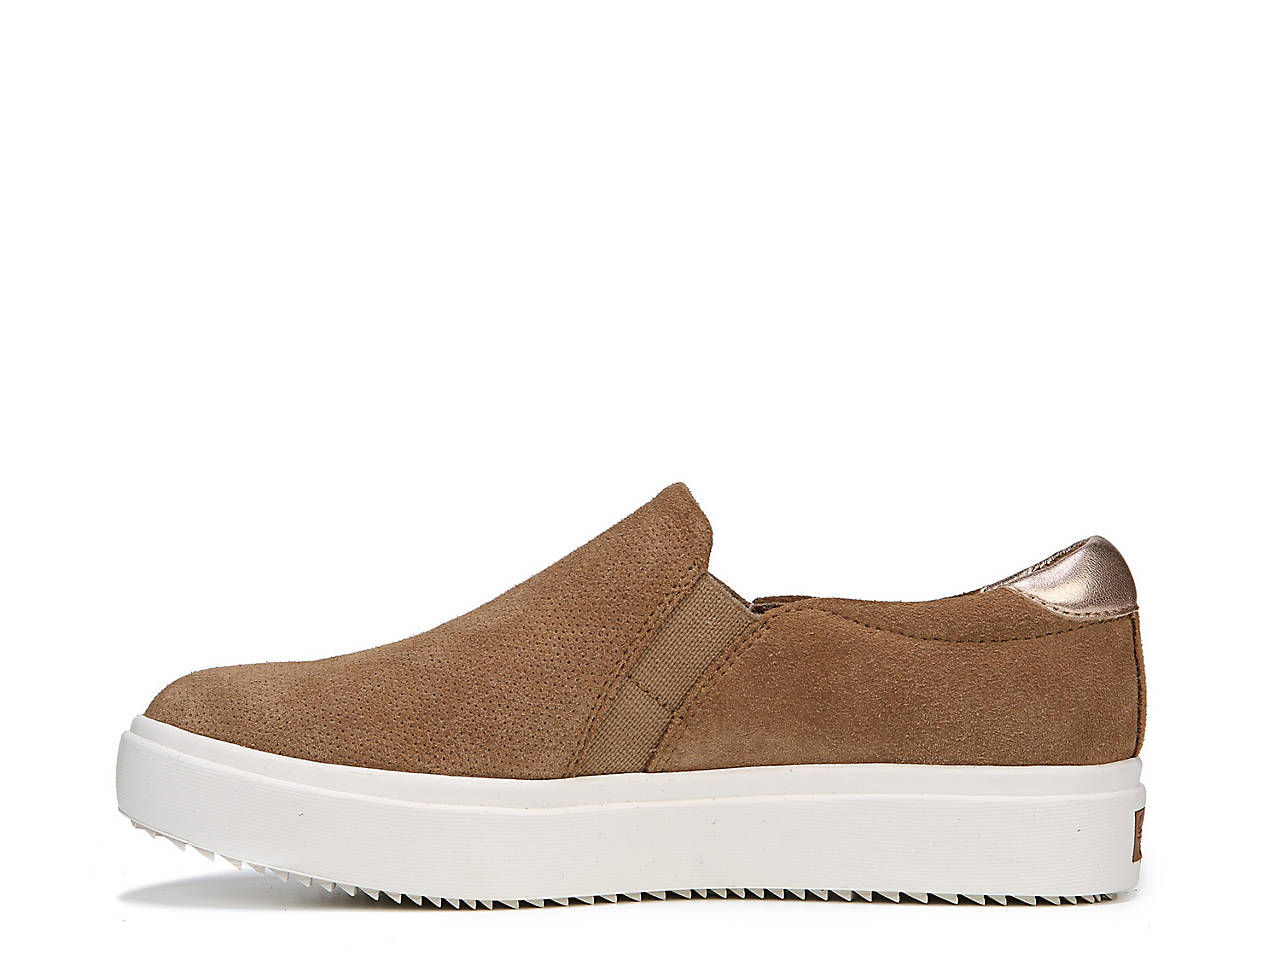 a1b9ac04208 Dr. Scholl s Leta Platform Slip-On Sneaker Women s Shoes